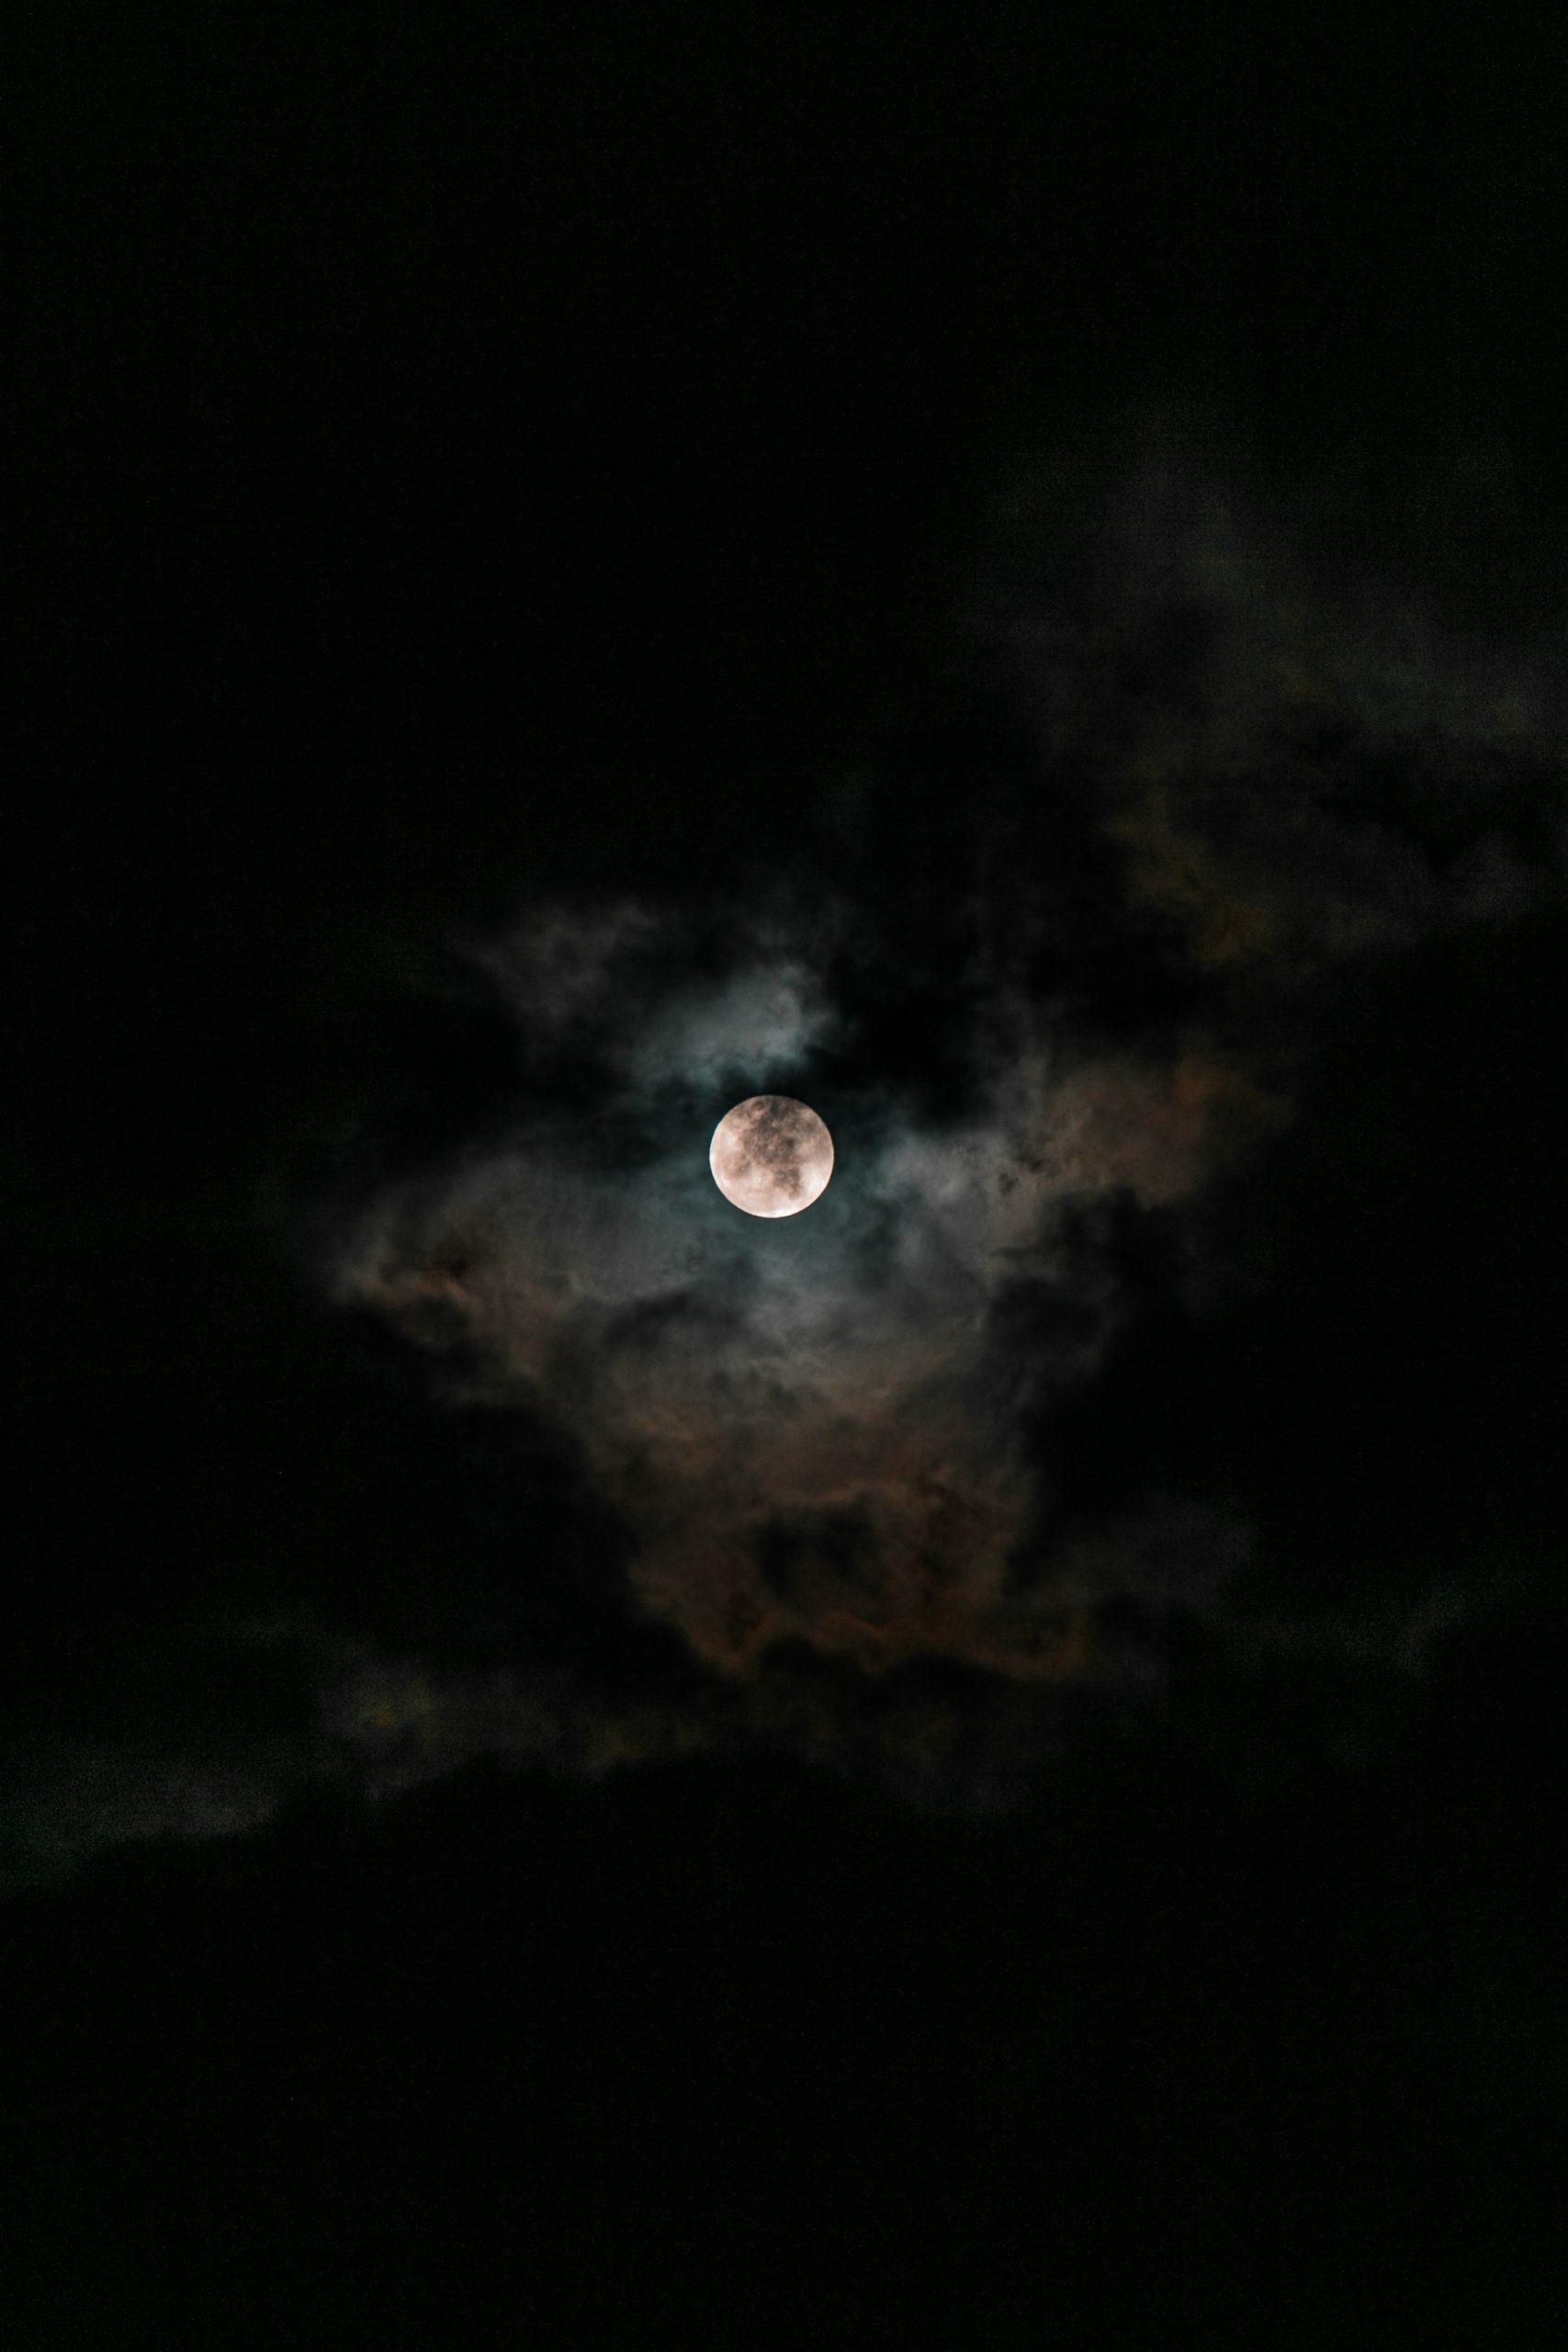 満月と狼男 〜Vollmond und Werwolf〜